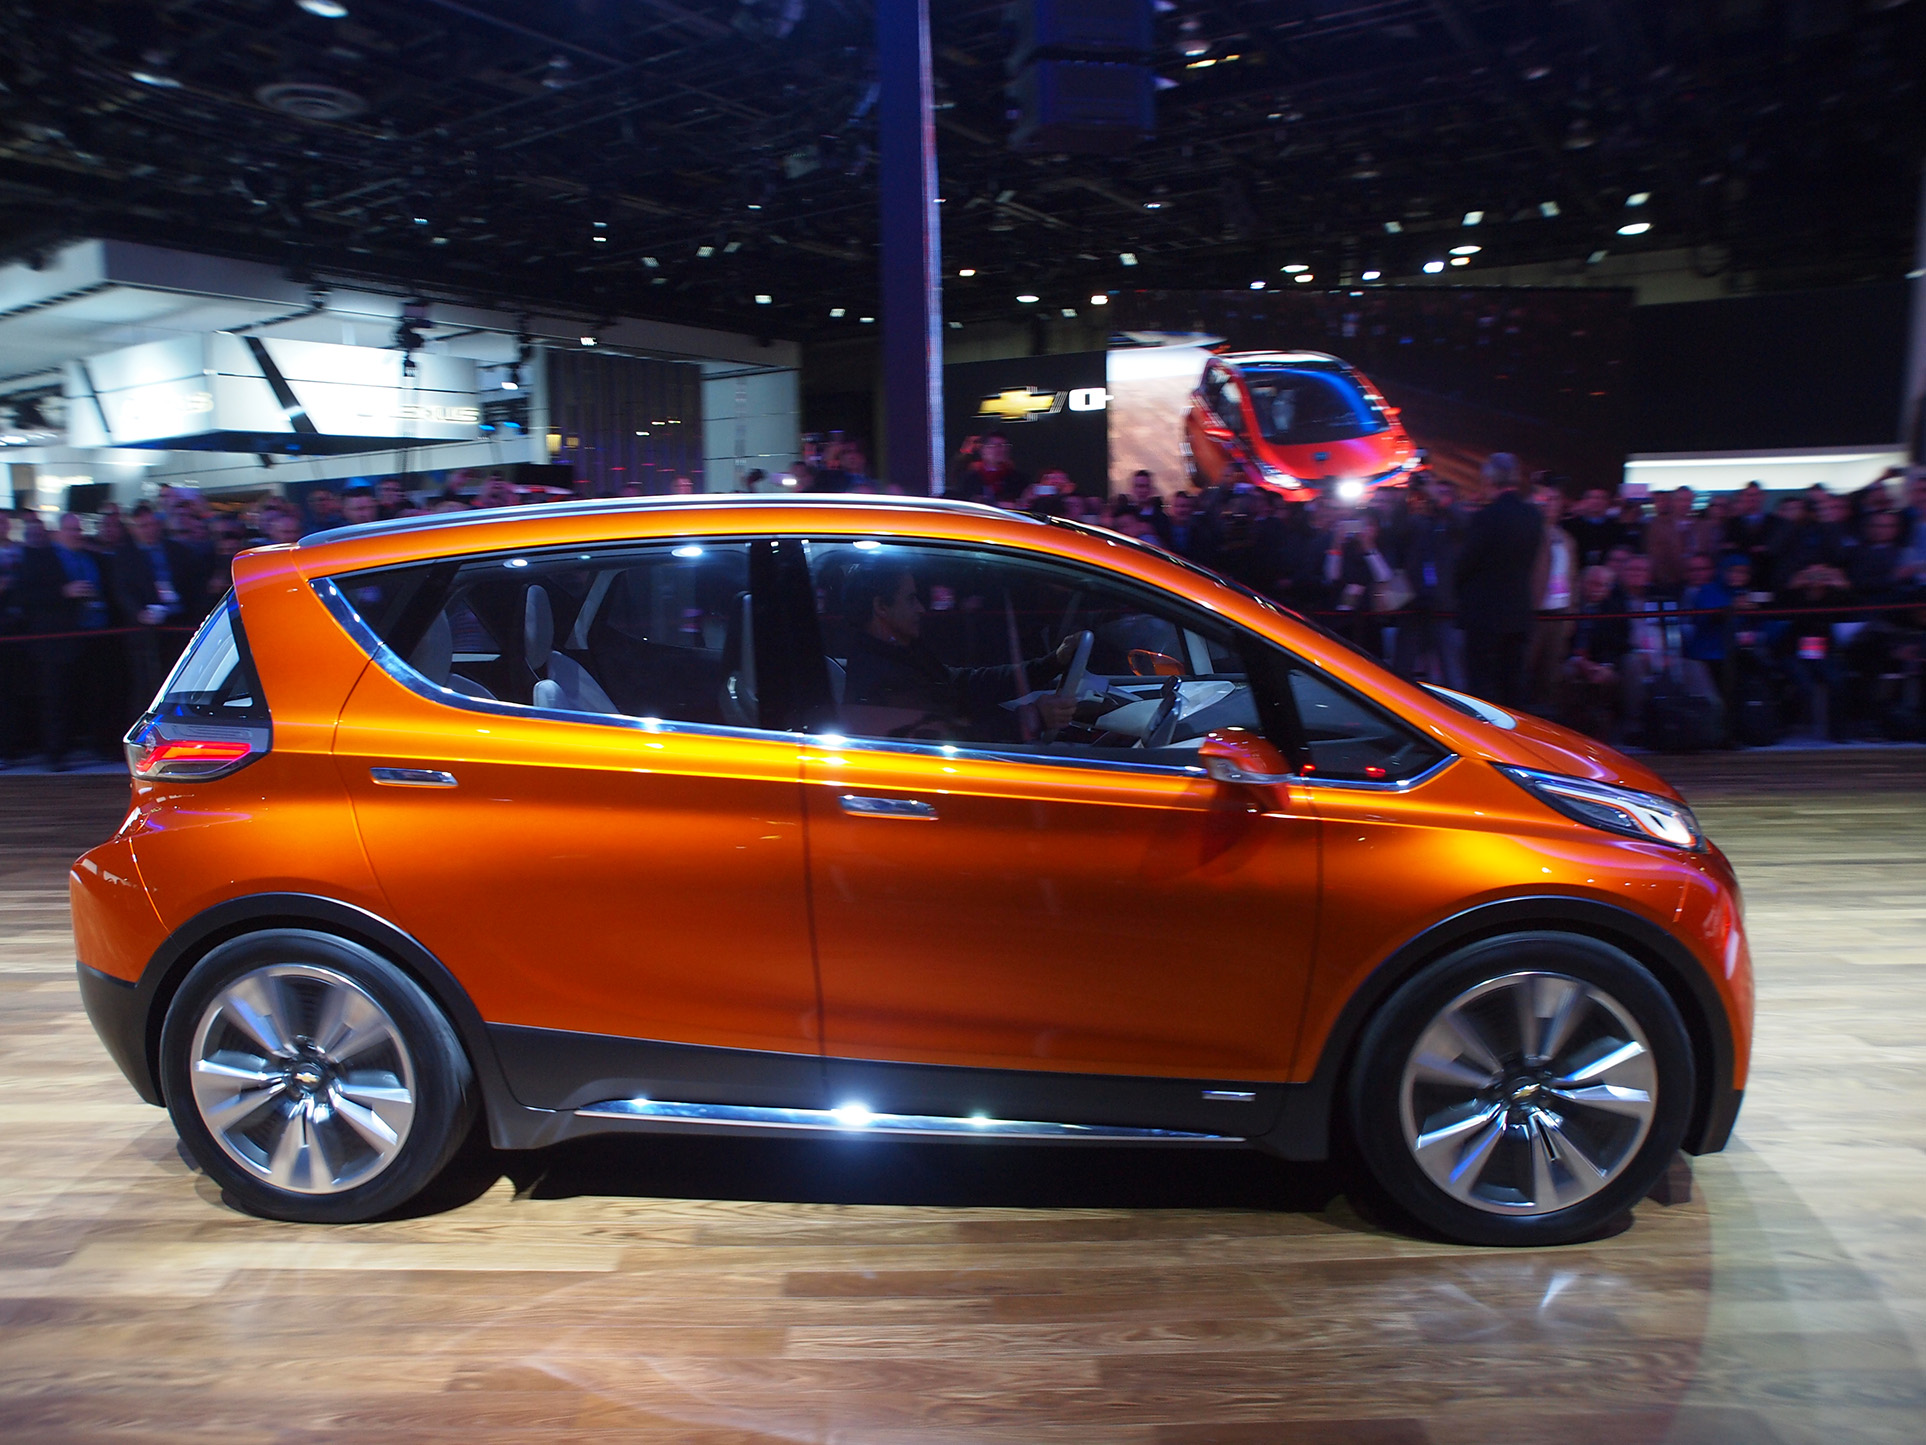 2018 Bolt Ev >> Chevrolet Bolt EV concept – US$30k, 320 km range Paul Tan - Image 302870